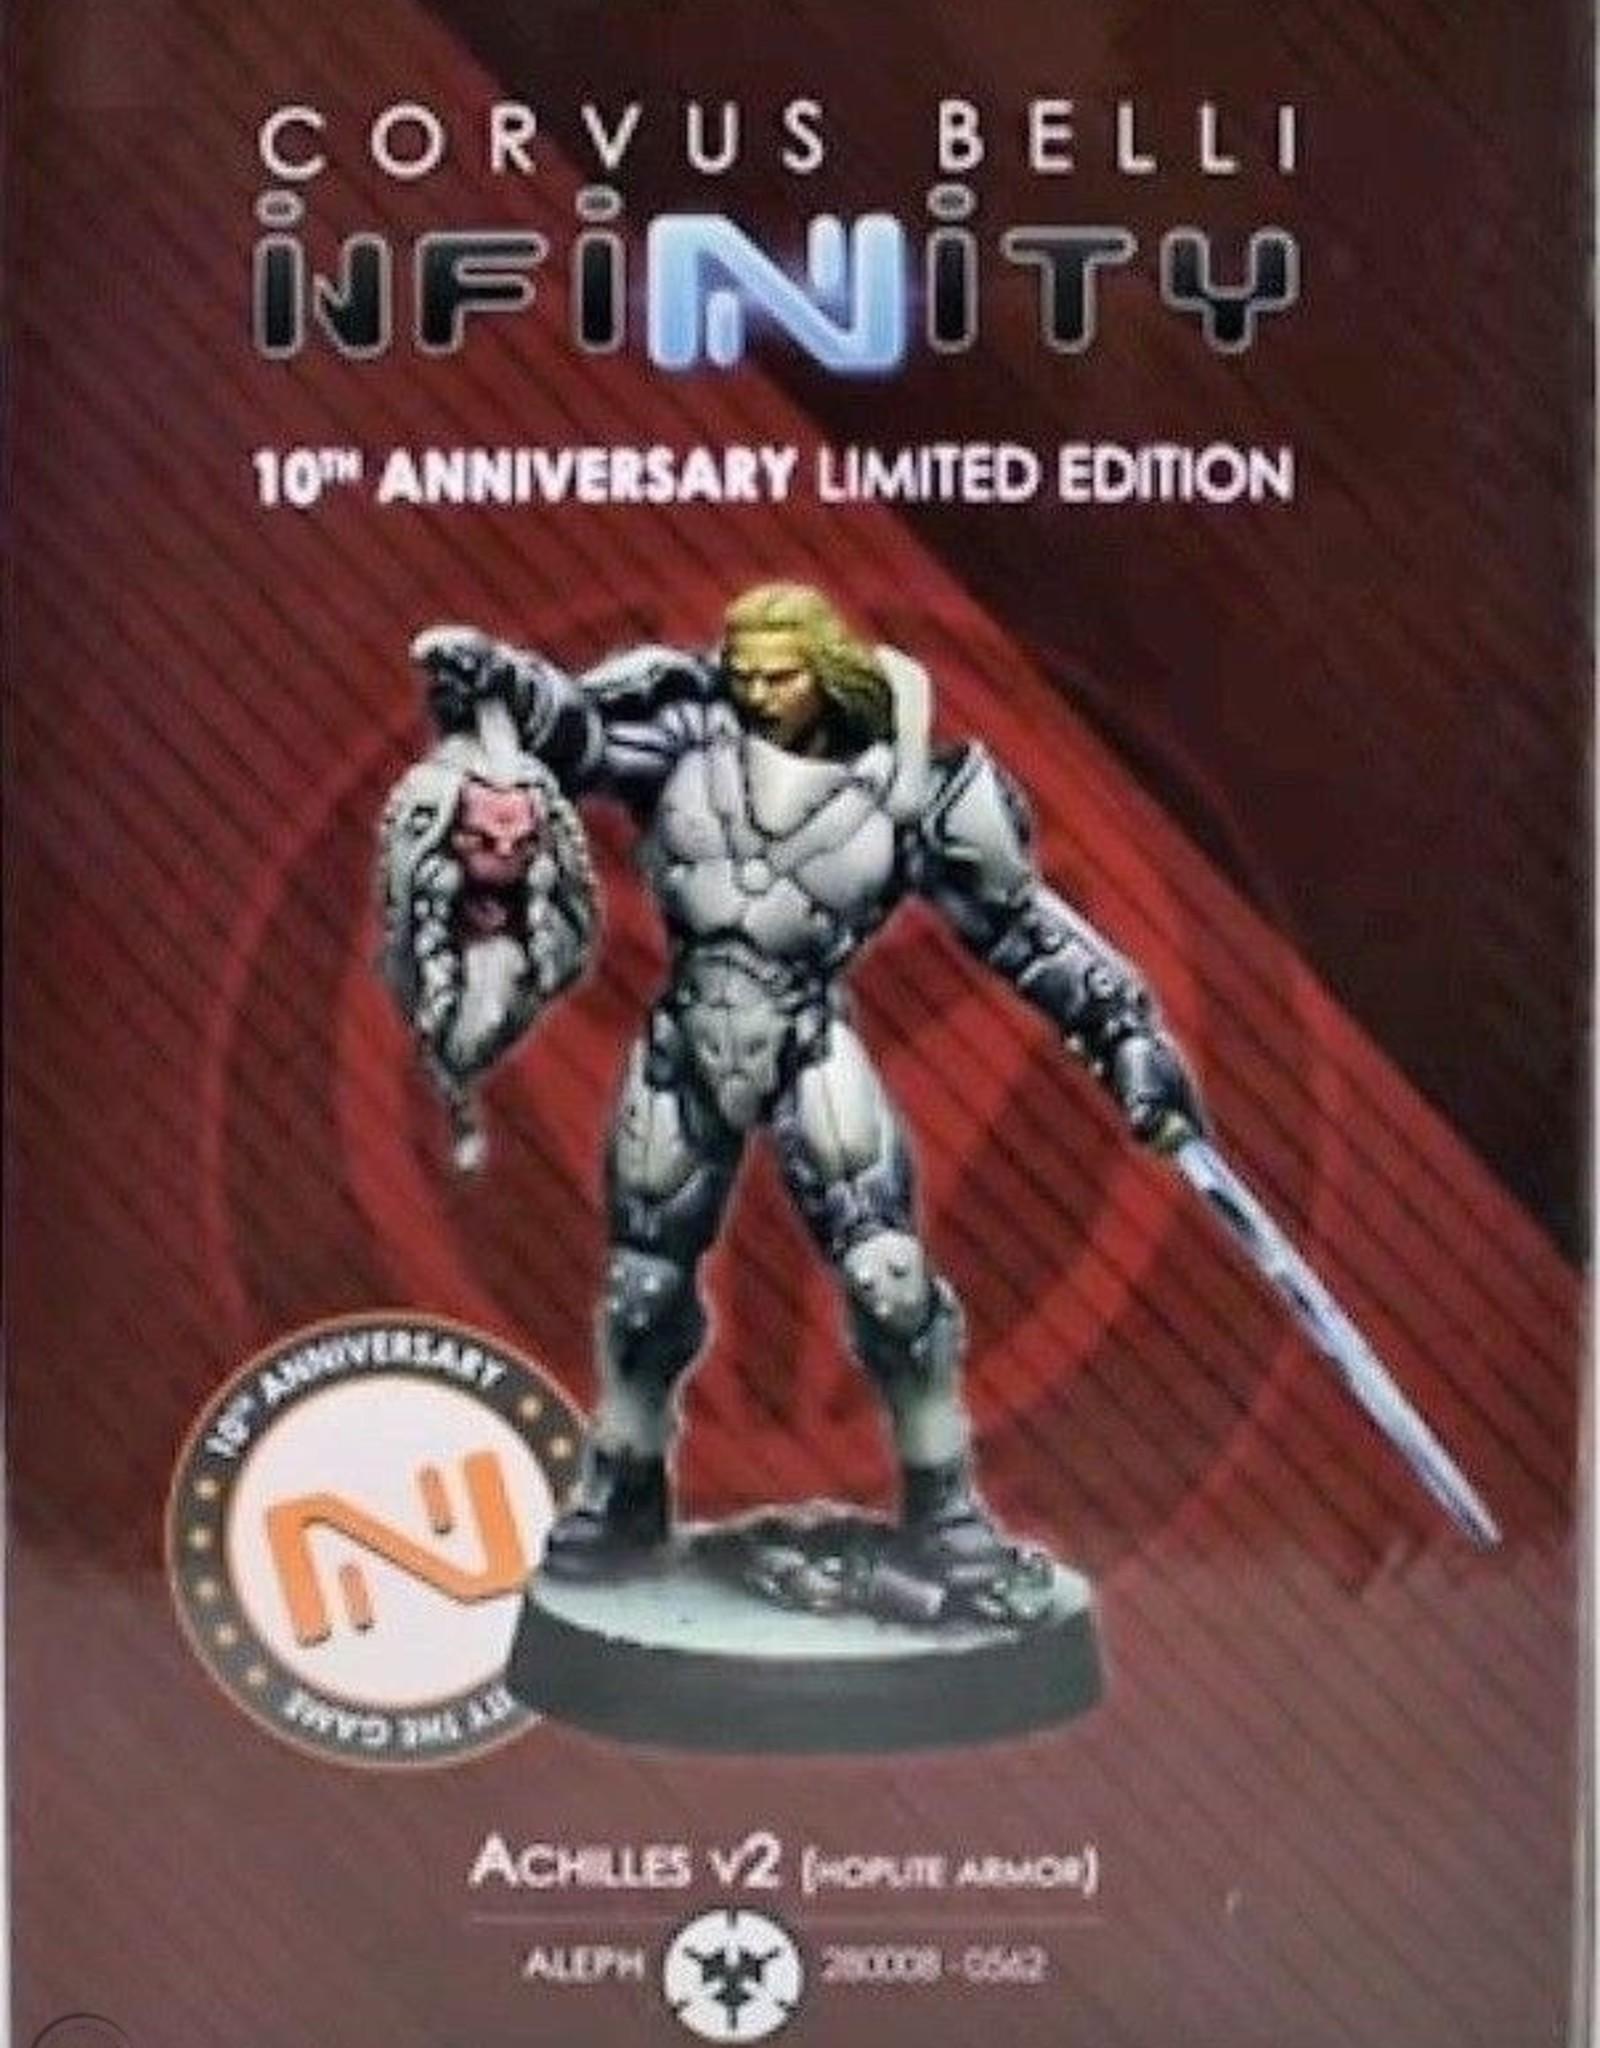 Corvus Belli Achilles V2 (Hoplite Armor) 10th anniversary Ltd Edition